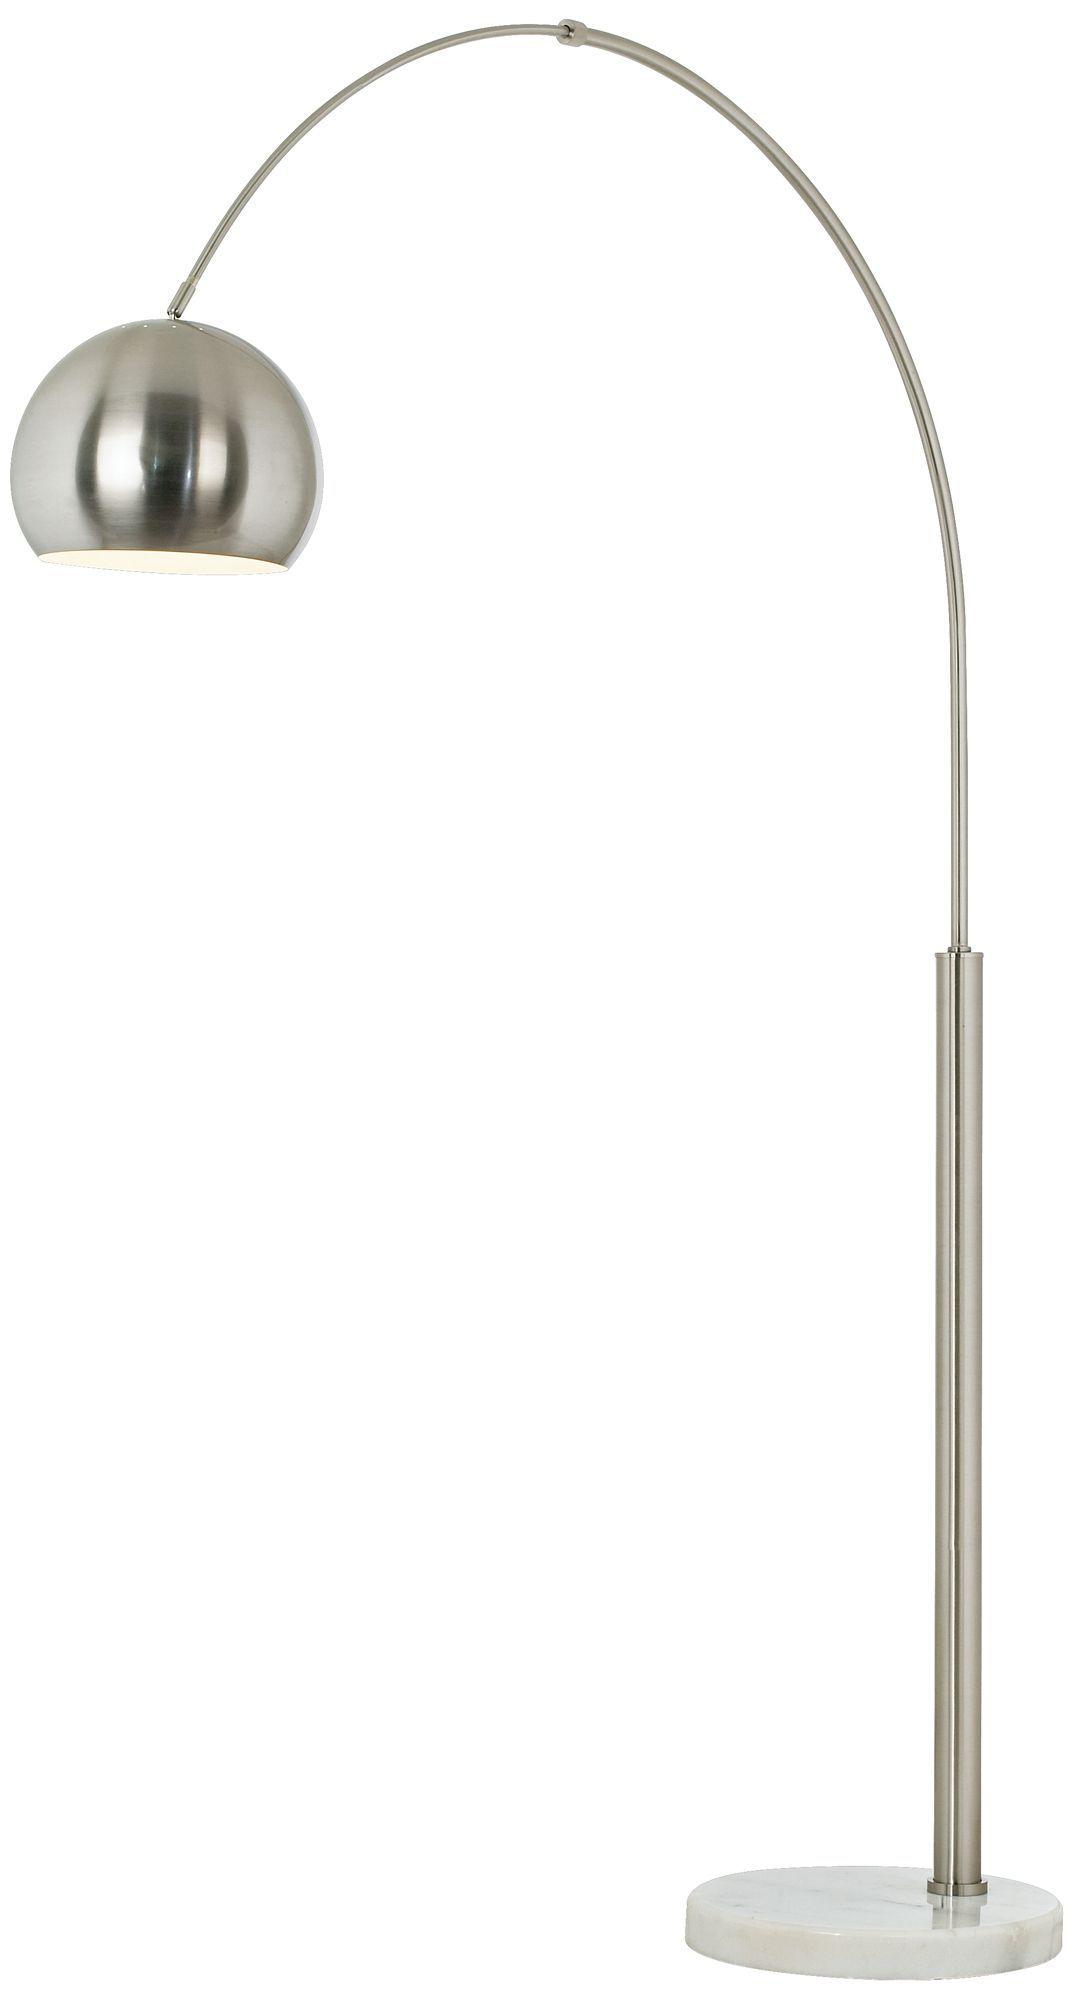 Basque Steel And Brushed Nickel Arc Floor Lamp Eurostylelighting Com A Living Room Arc